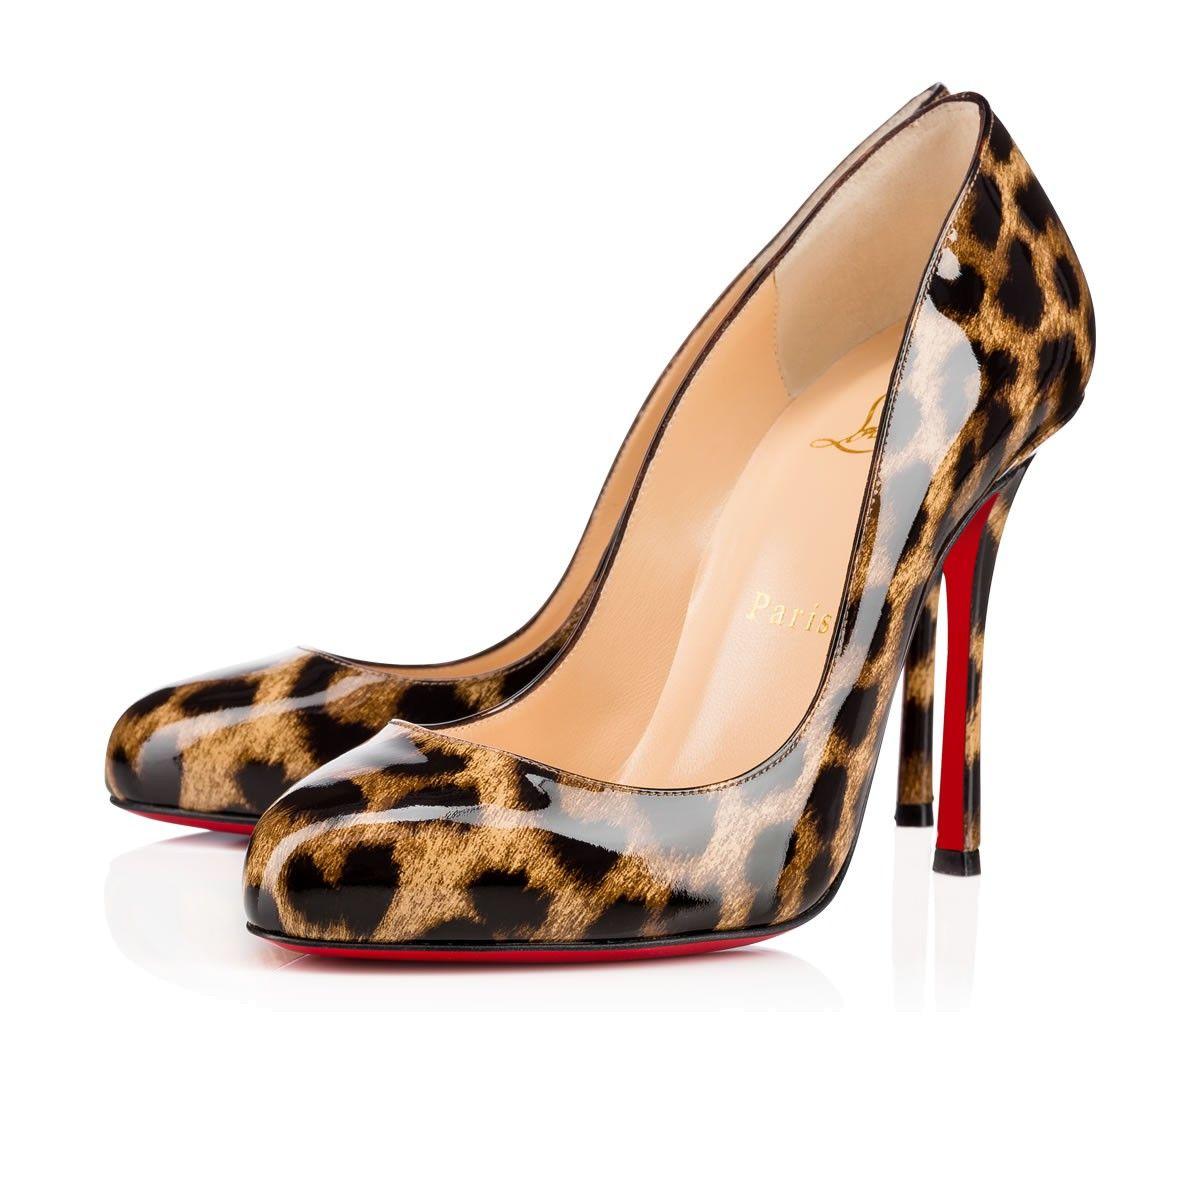 7a6c817f0be5 CHRISTIAN LOUBOUTIN Merci Allen 100 Brown Leopard Patent Leather - Women  Shoes - Christian Louboutin.